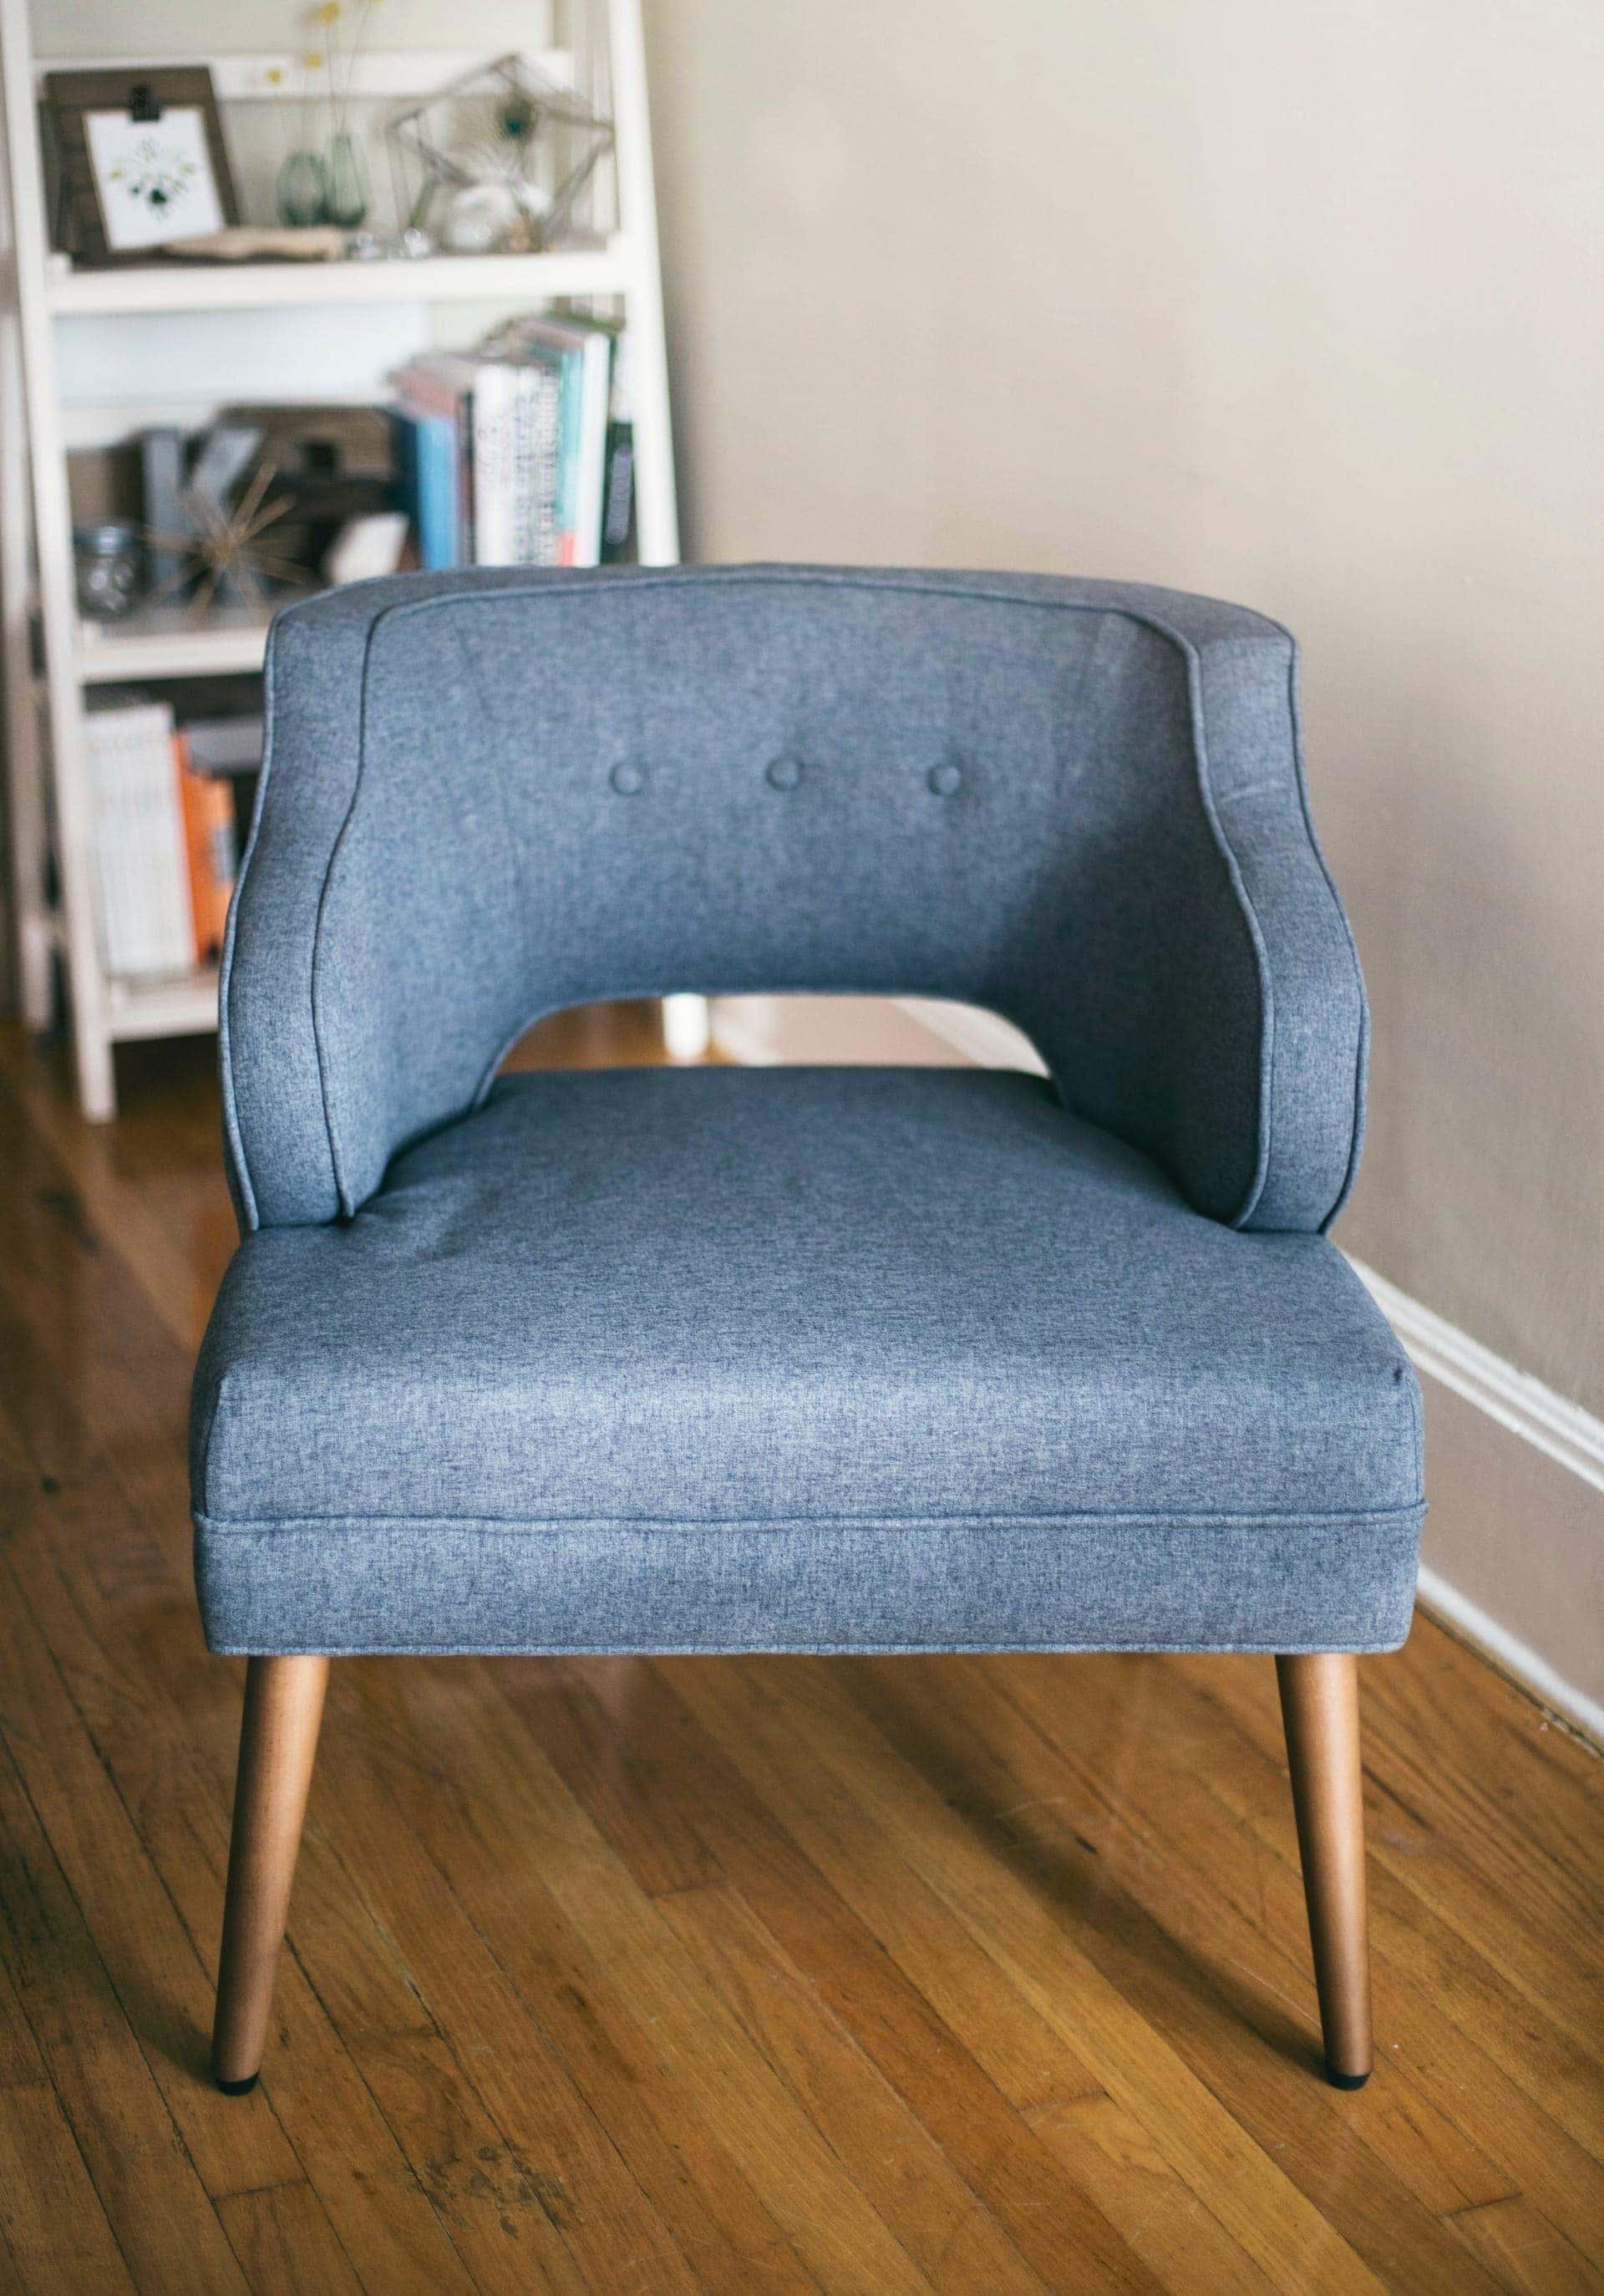 Sofa chair single seater